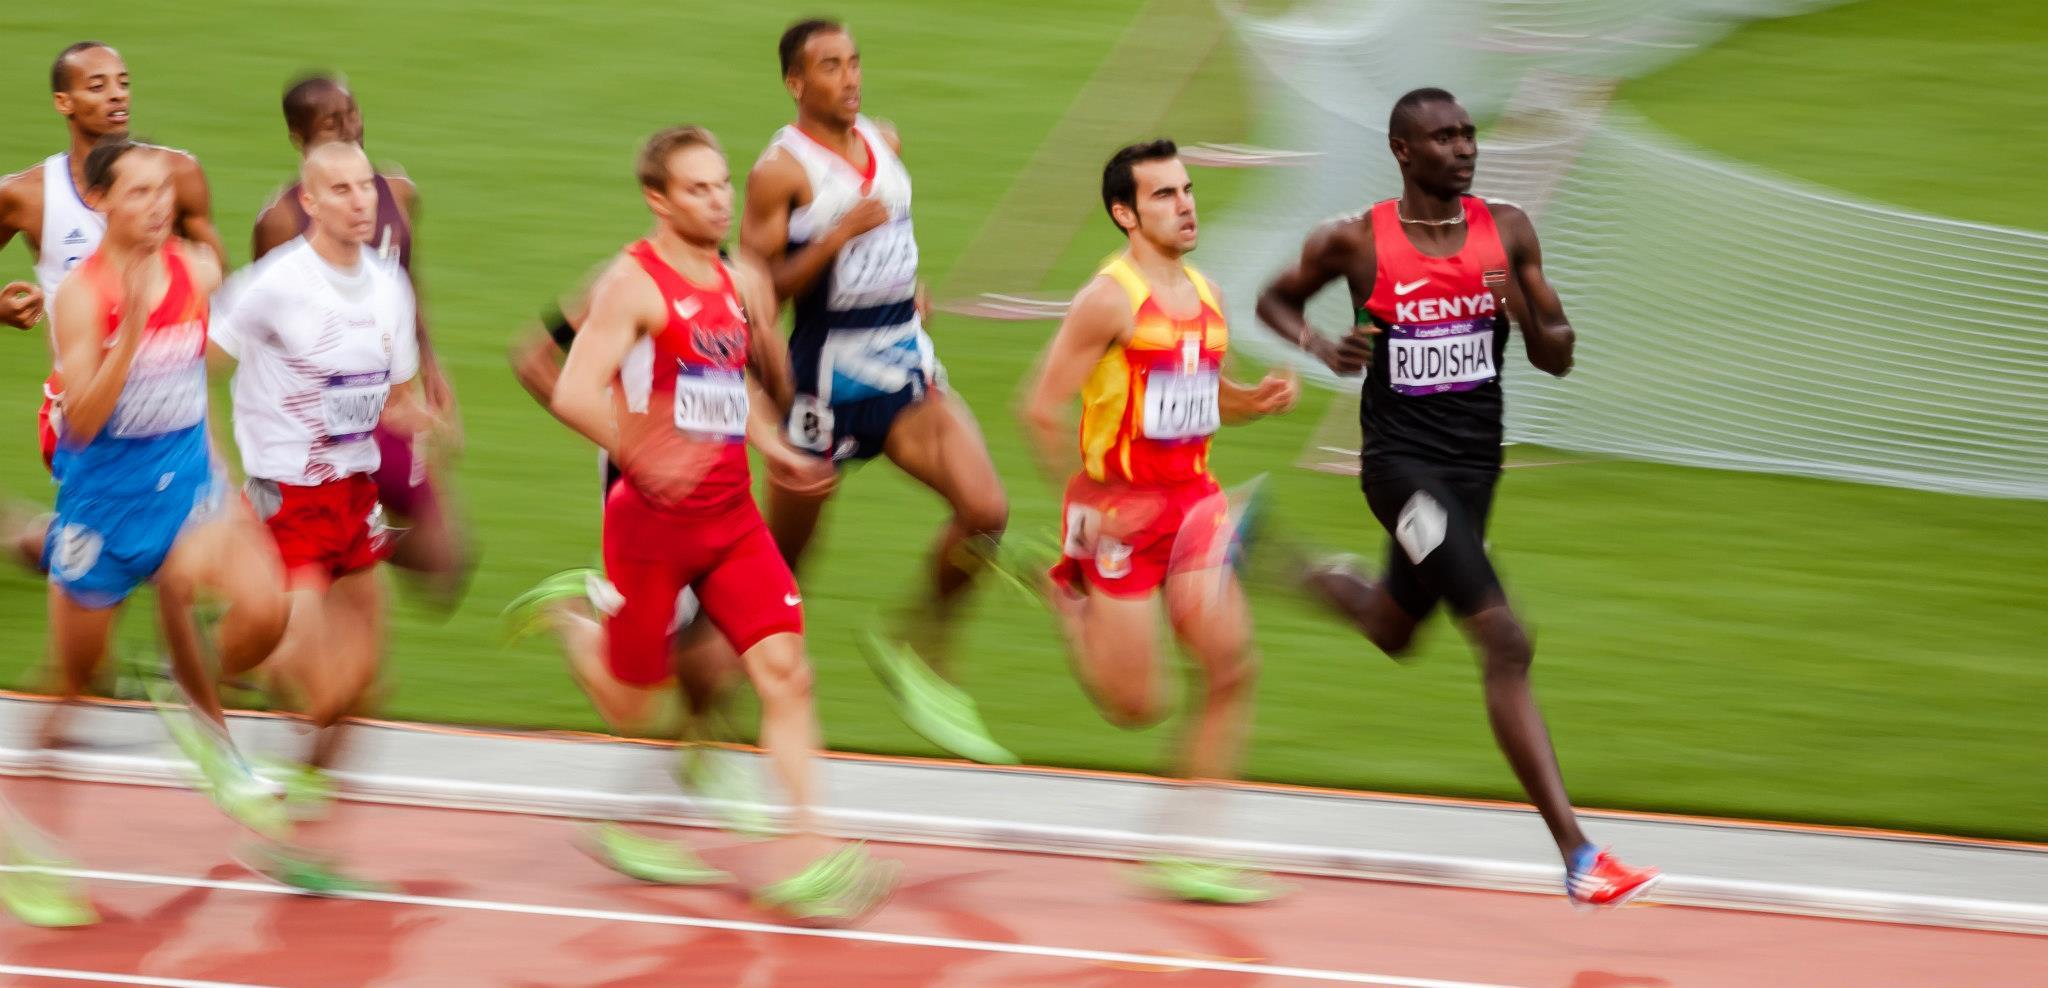 David Rudisha London 2012 800m final